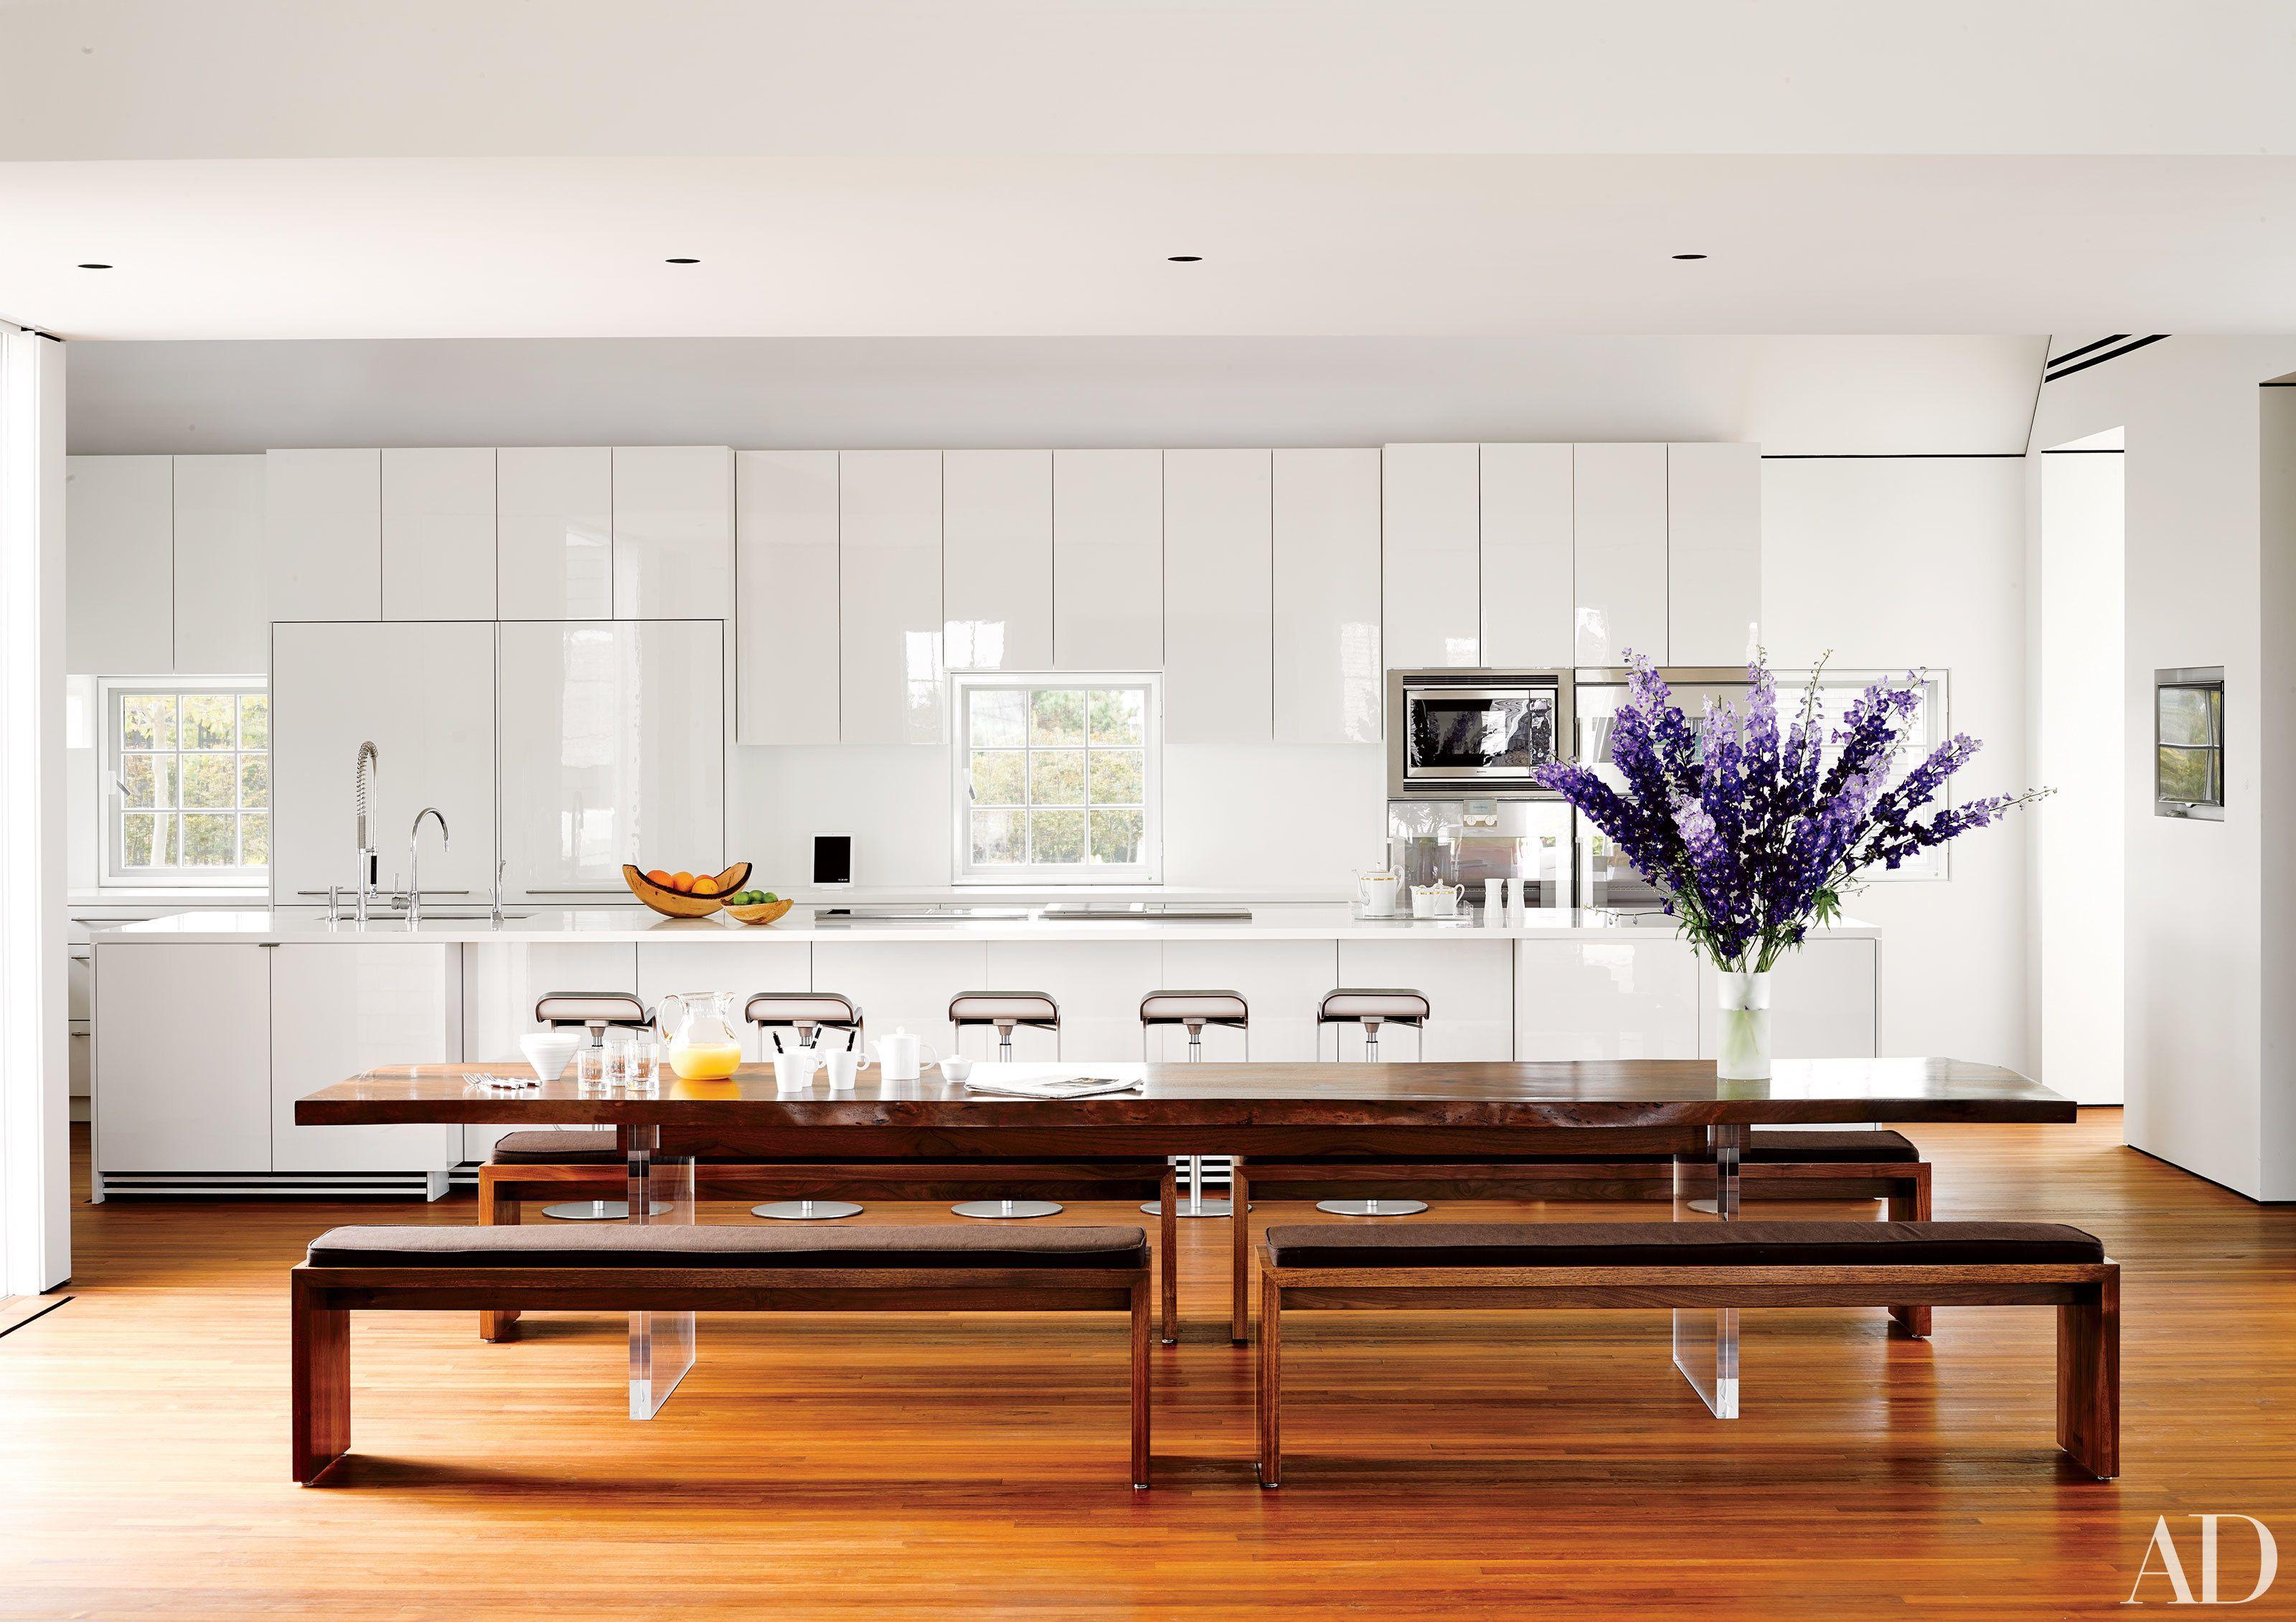 White Kitchens Design Ideas  Architectural Digest Kitchen Design Stunning White Kitchen Design Ideas Design Ideas